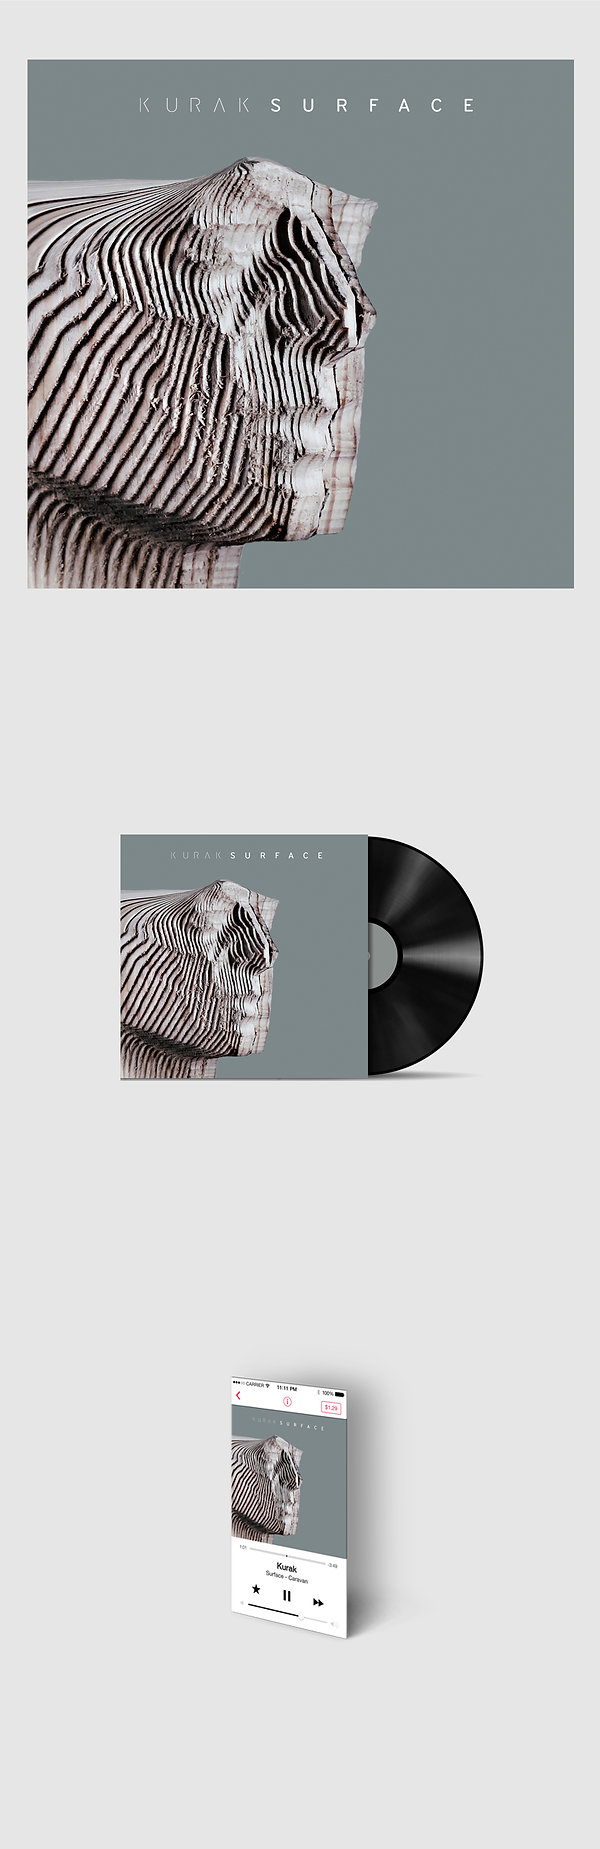 Kurak Surface Album